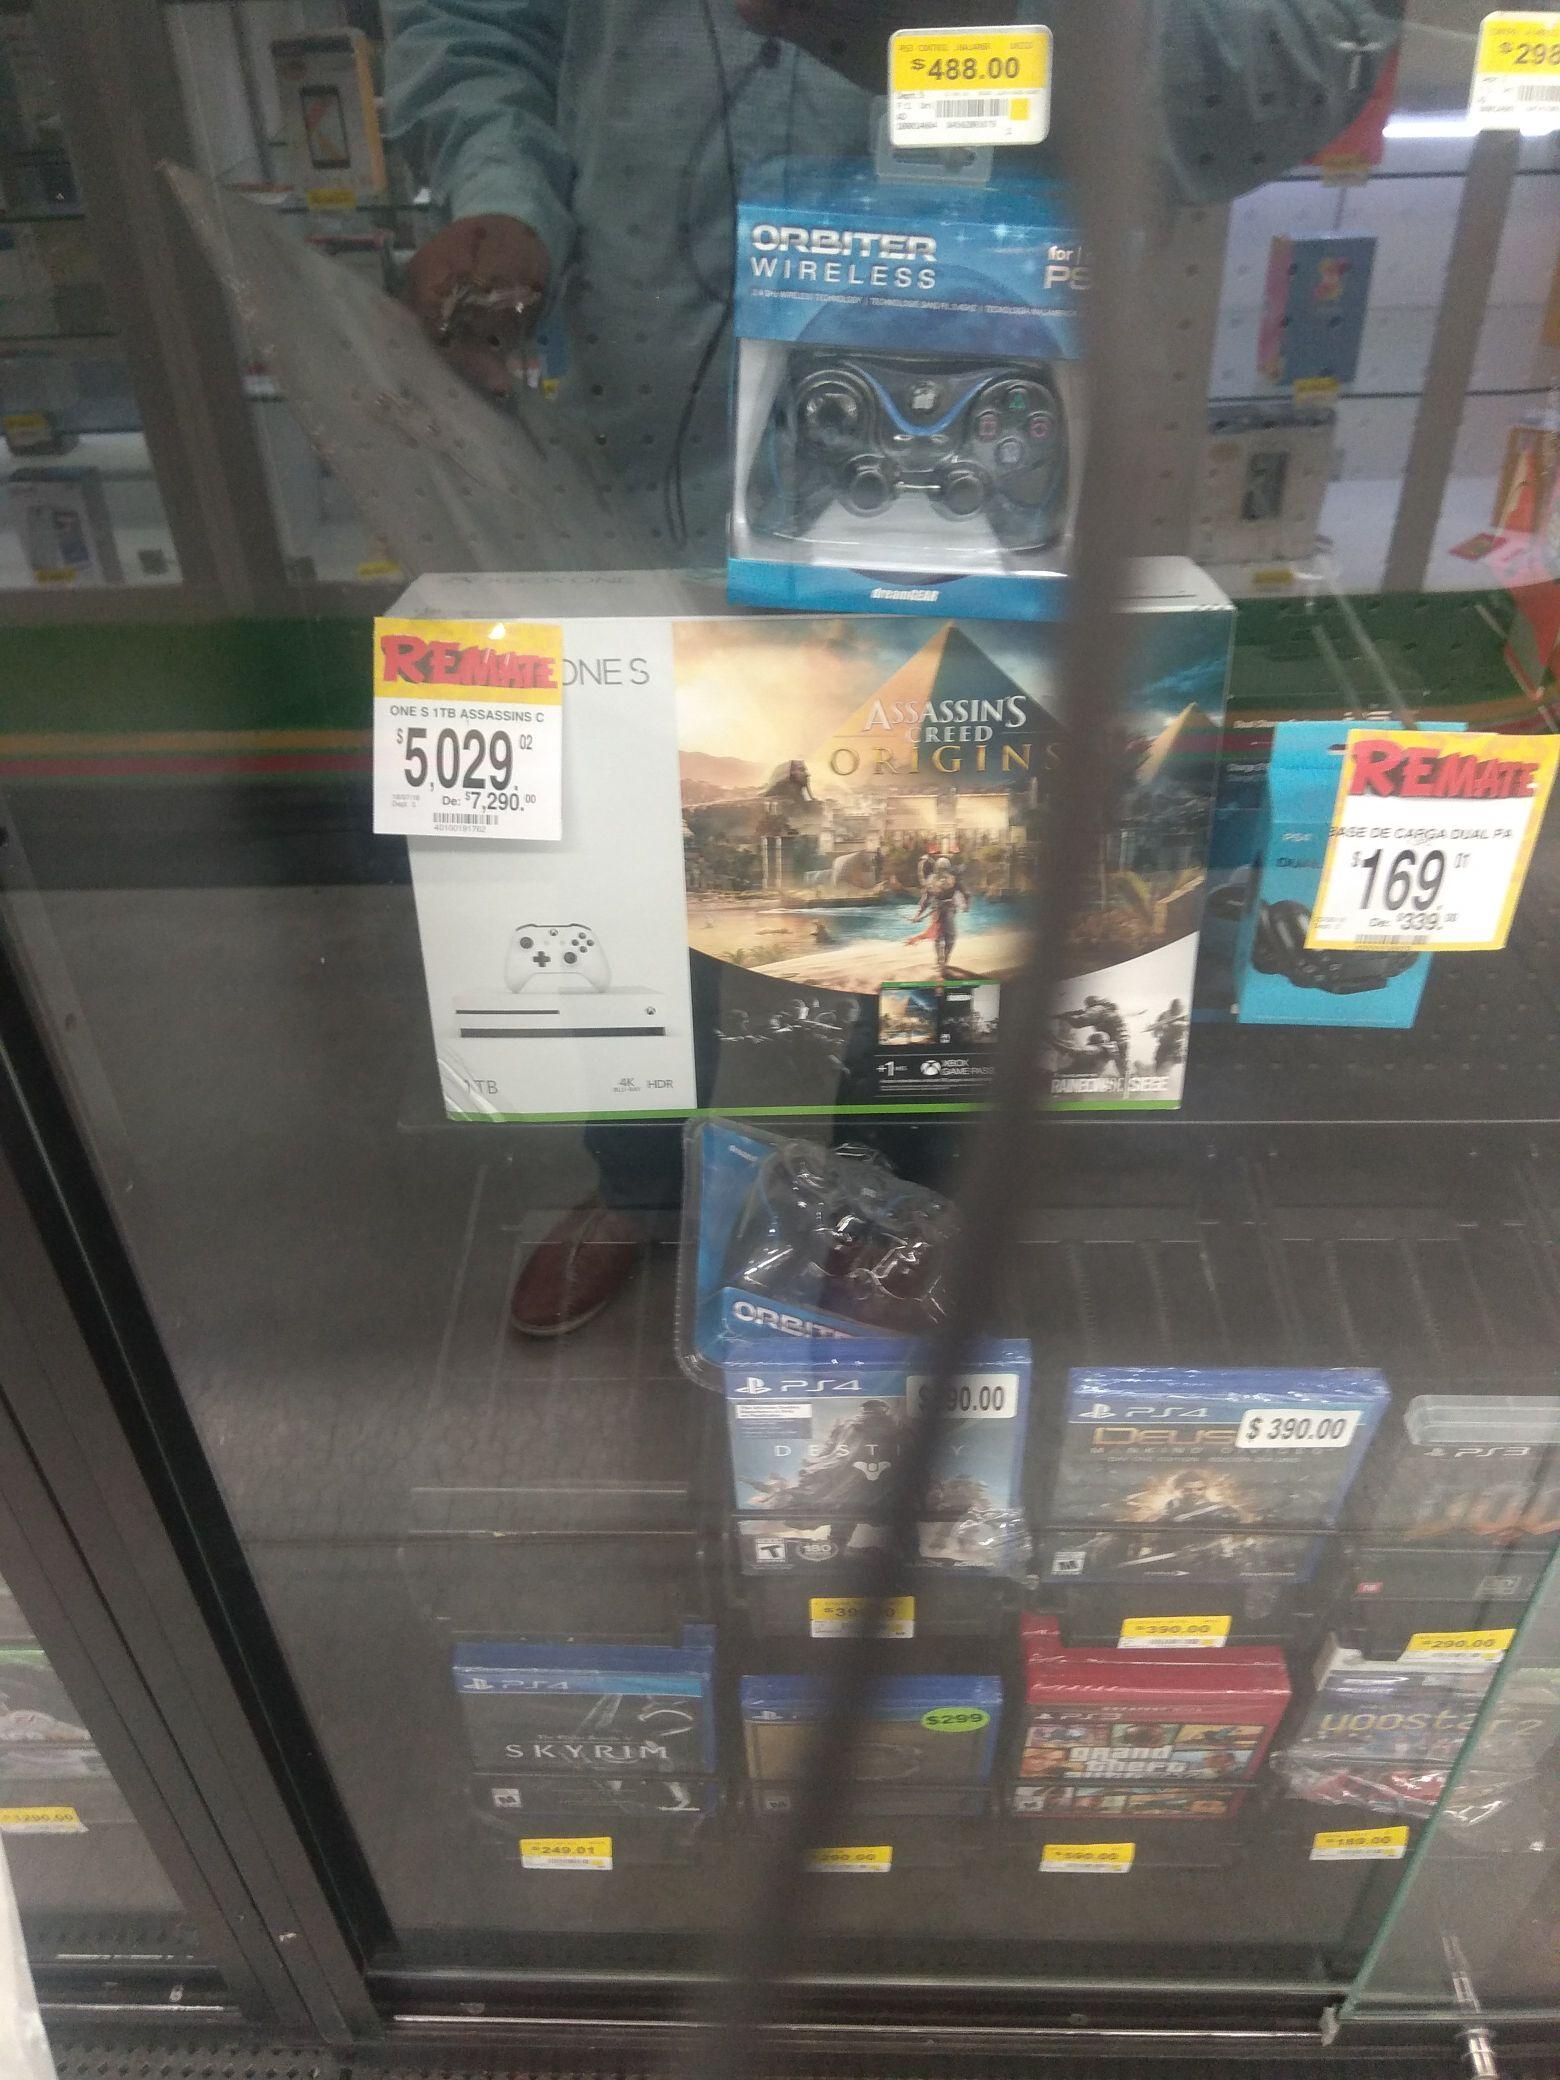 Bodega Aurrera: Xbox One S Assains Creed Origins 1TB